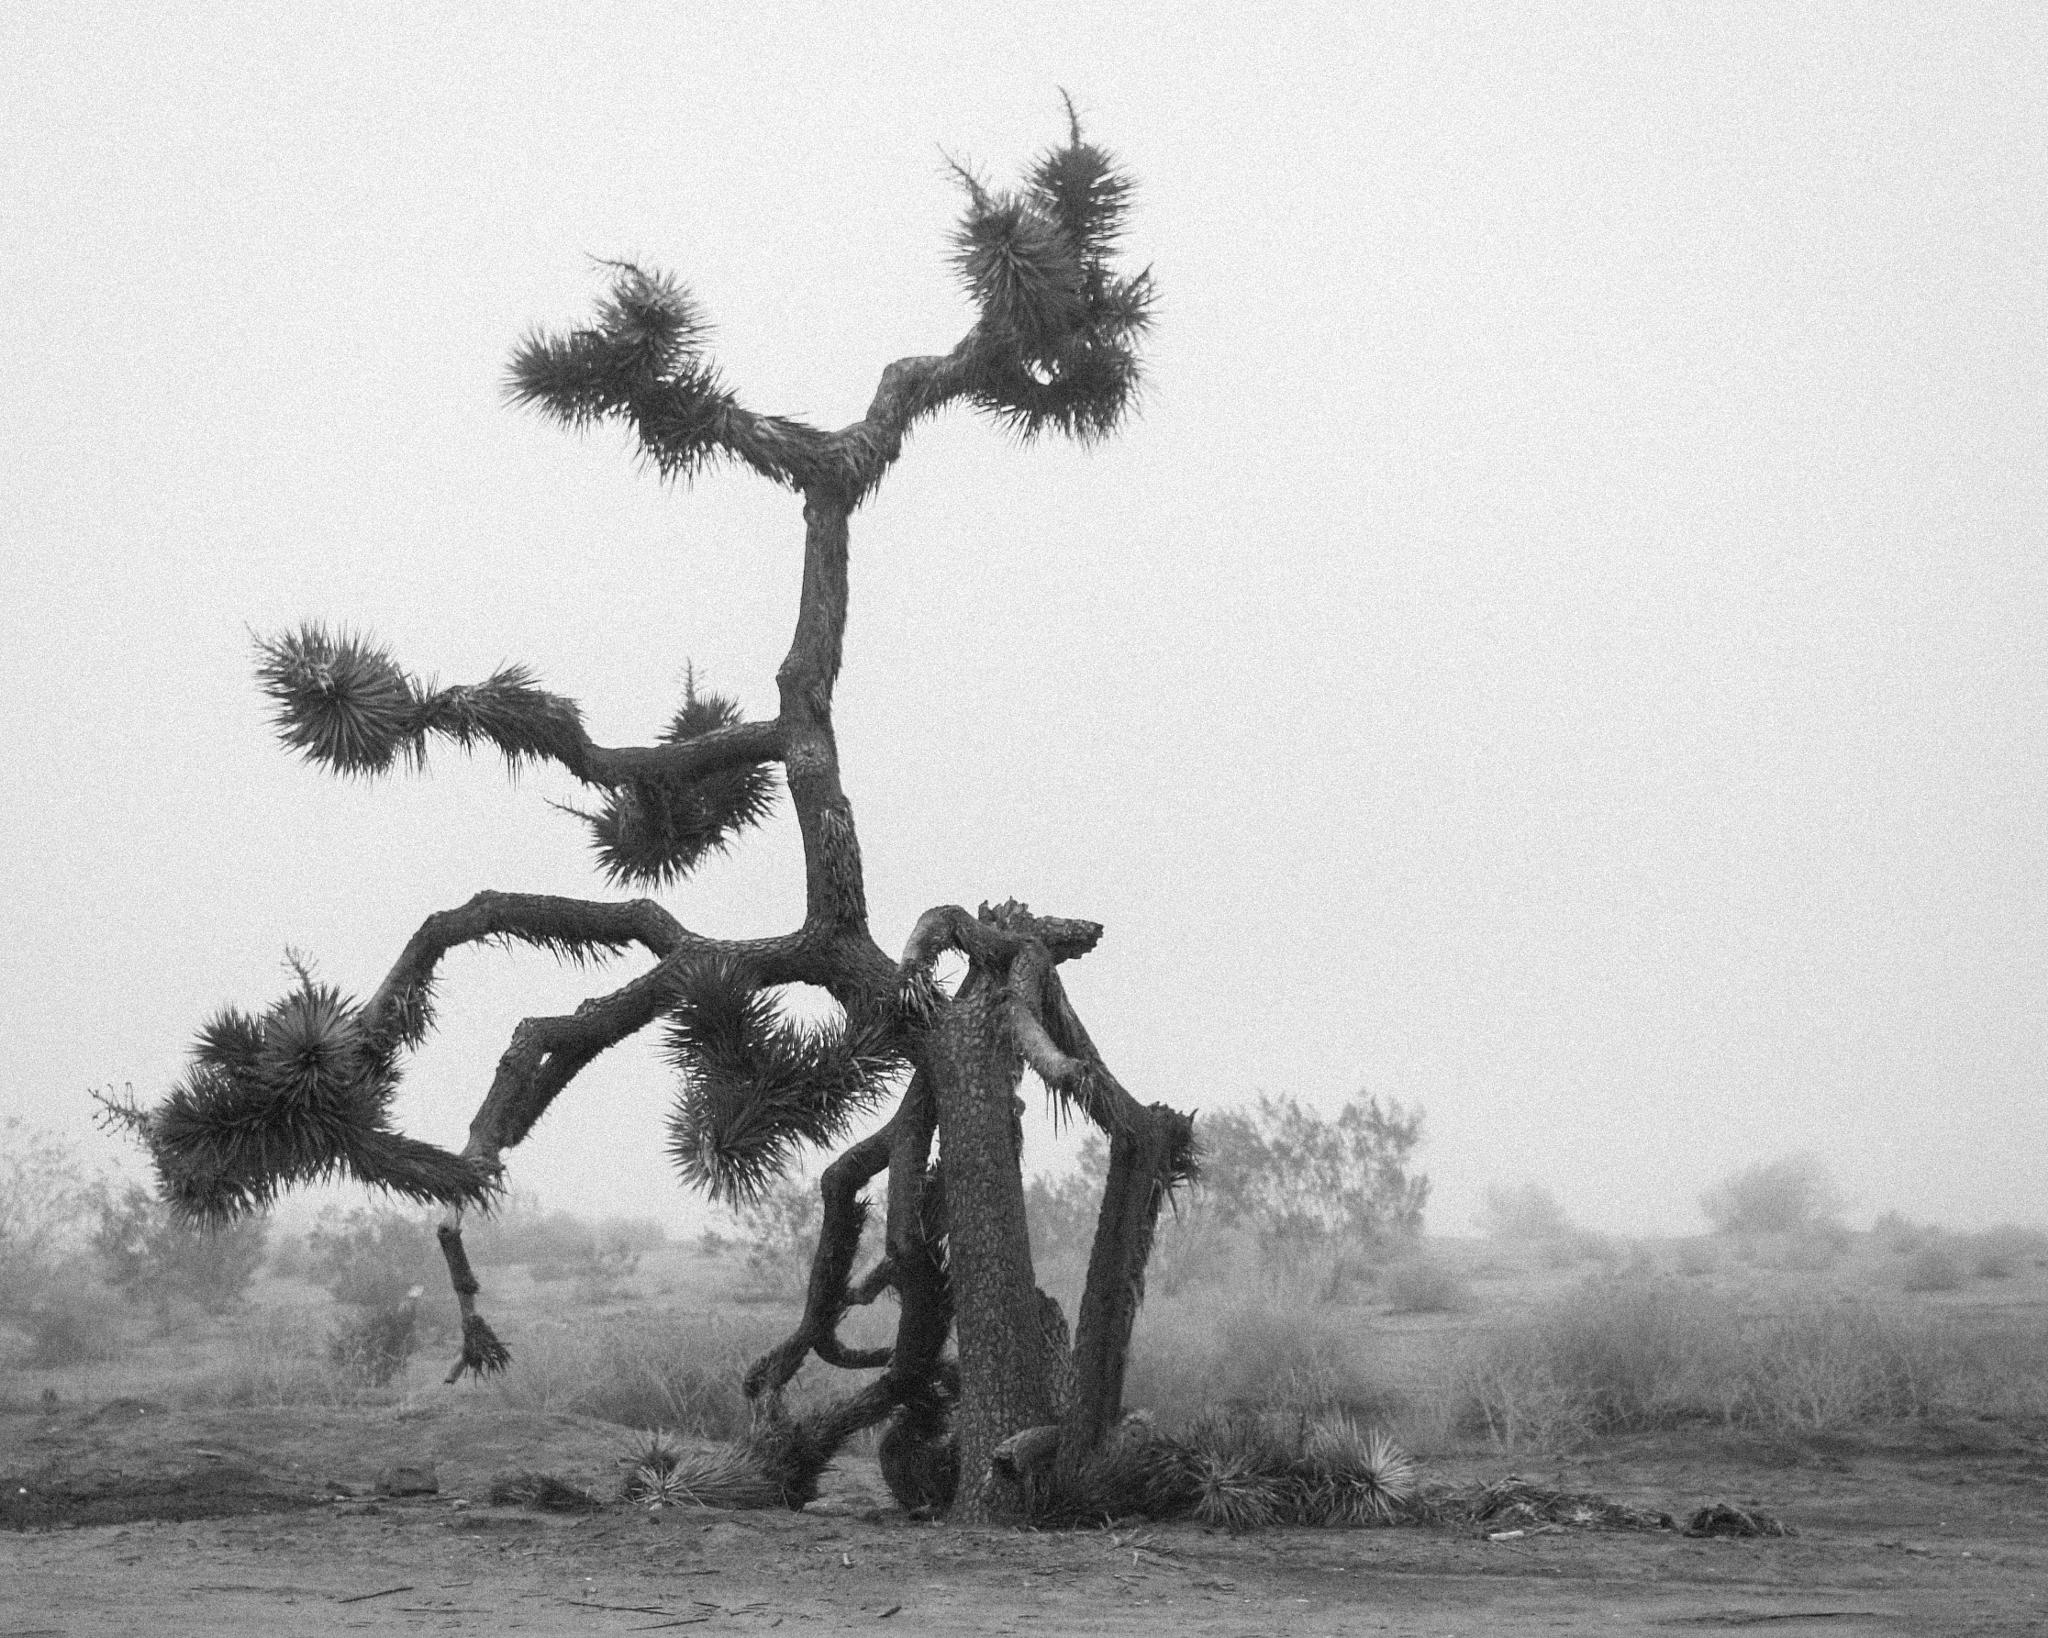 Joshua tree in the fog. by Kim Sanders